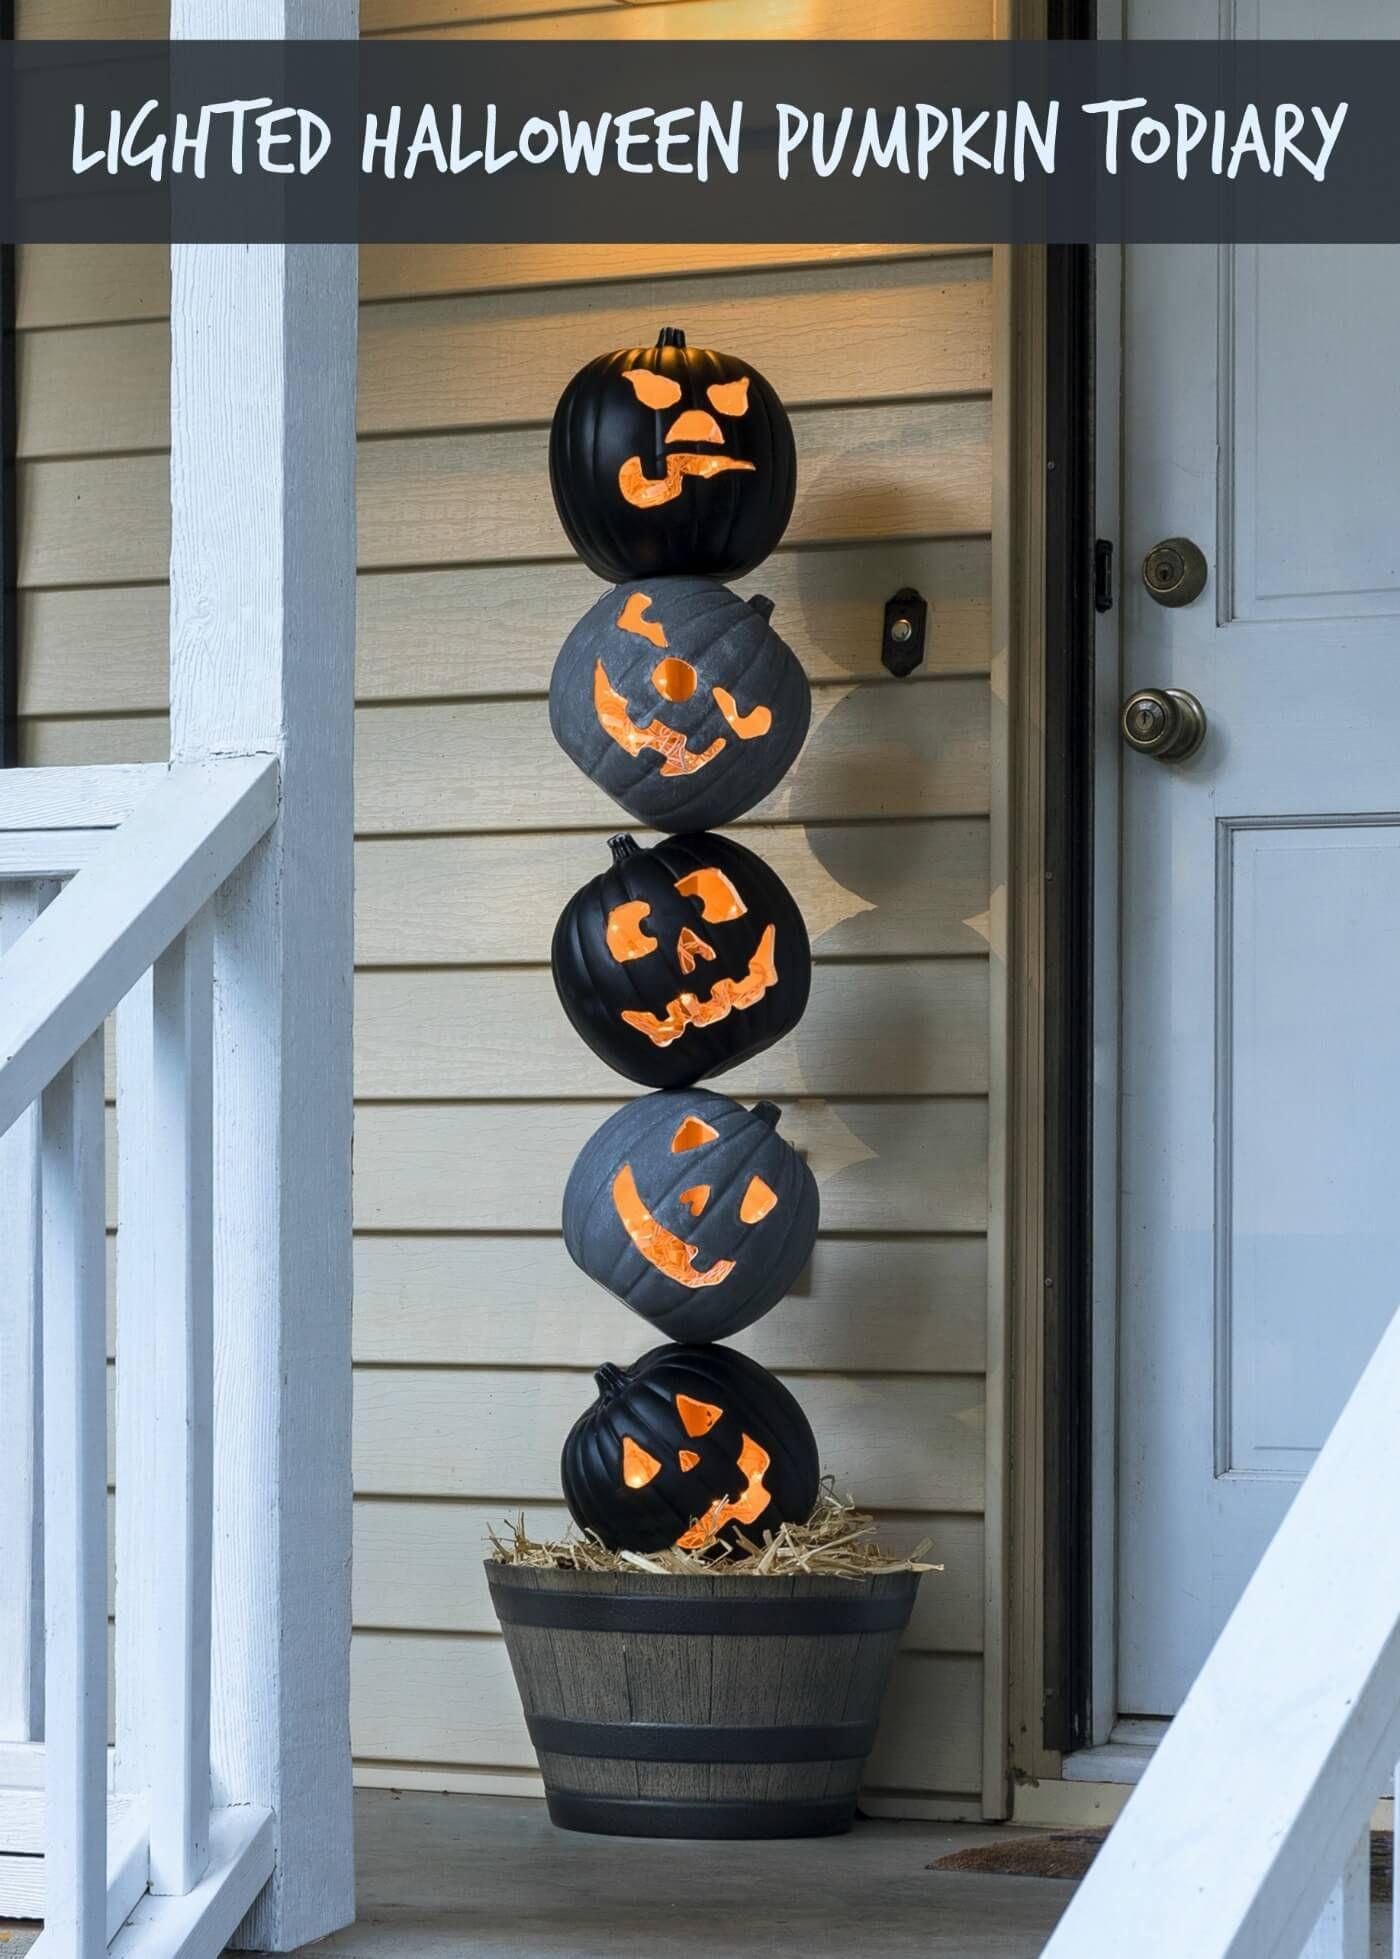 Lighted Outdoor Halloween Pumpkin Topiary Holiday